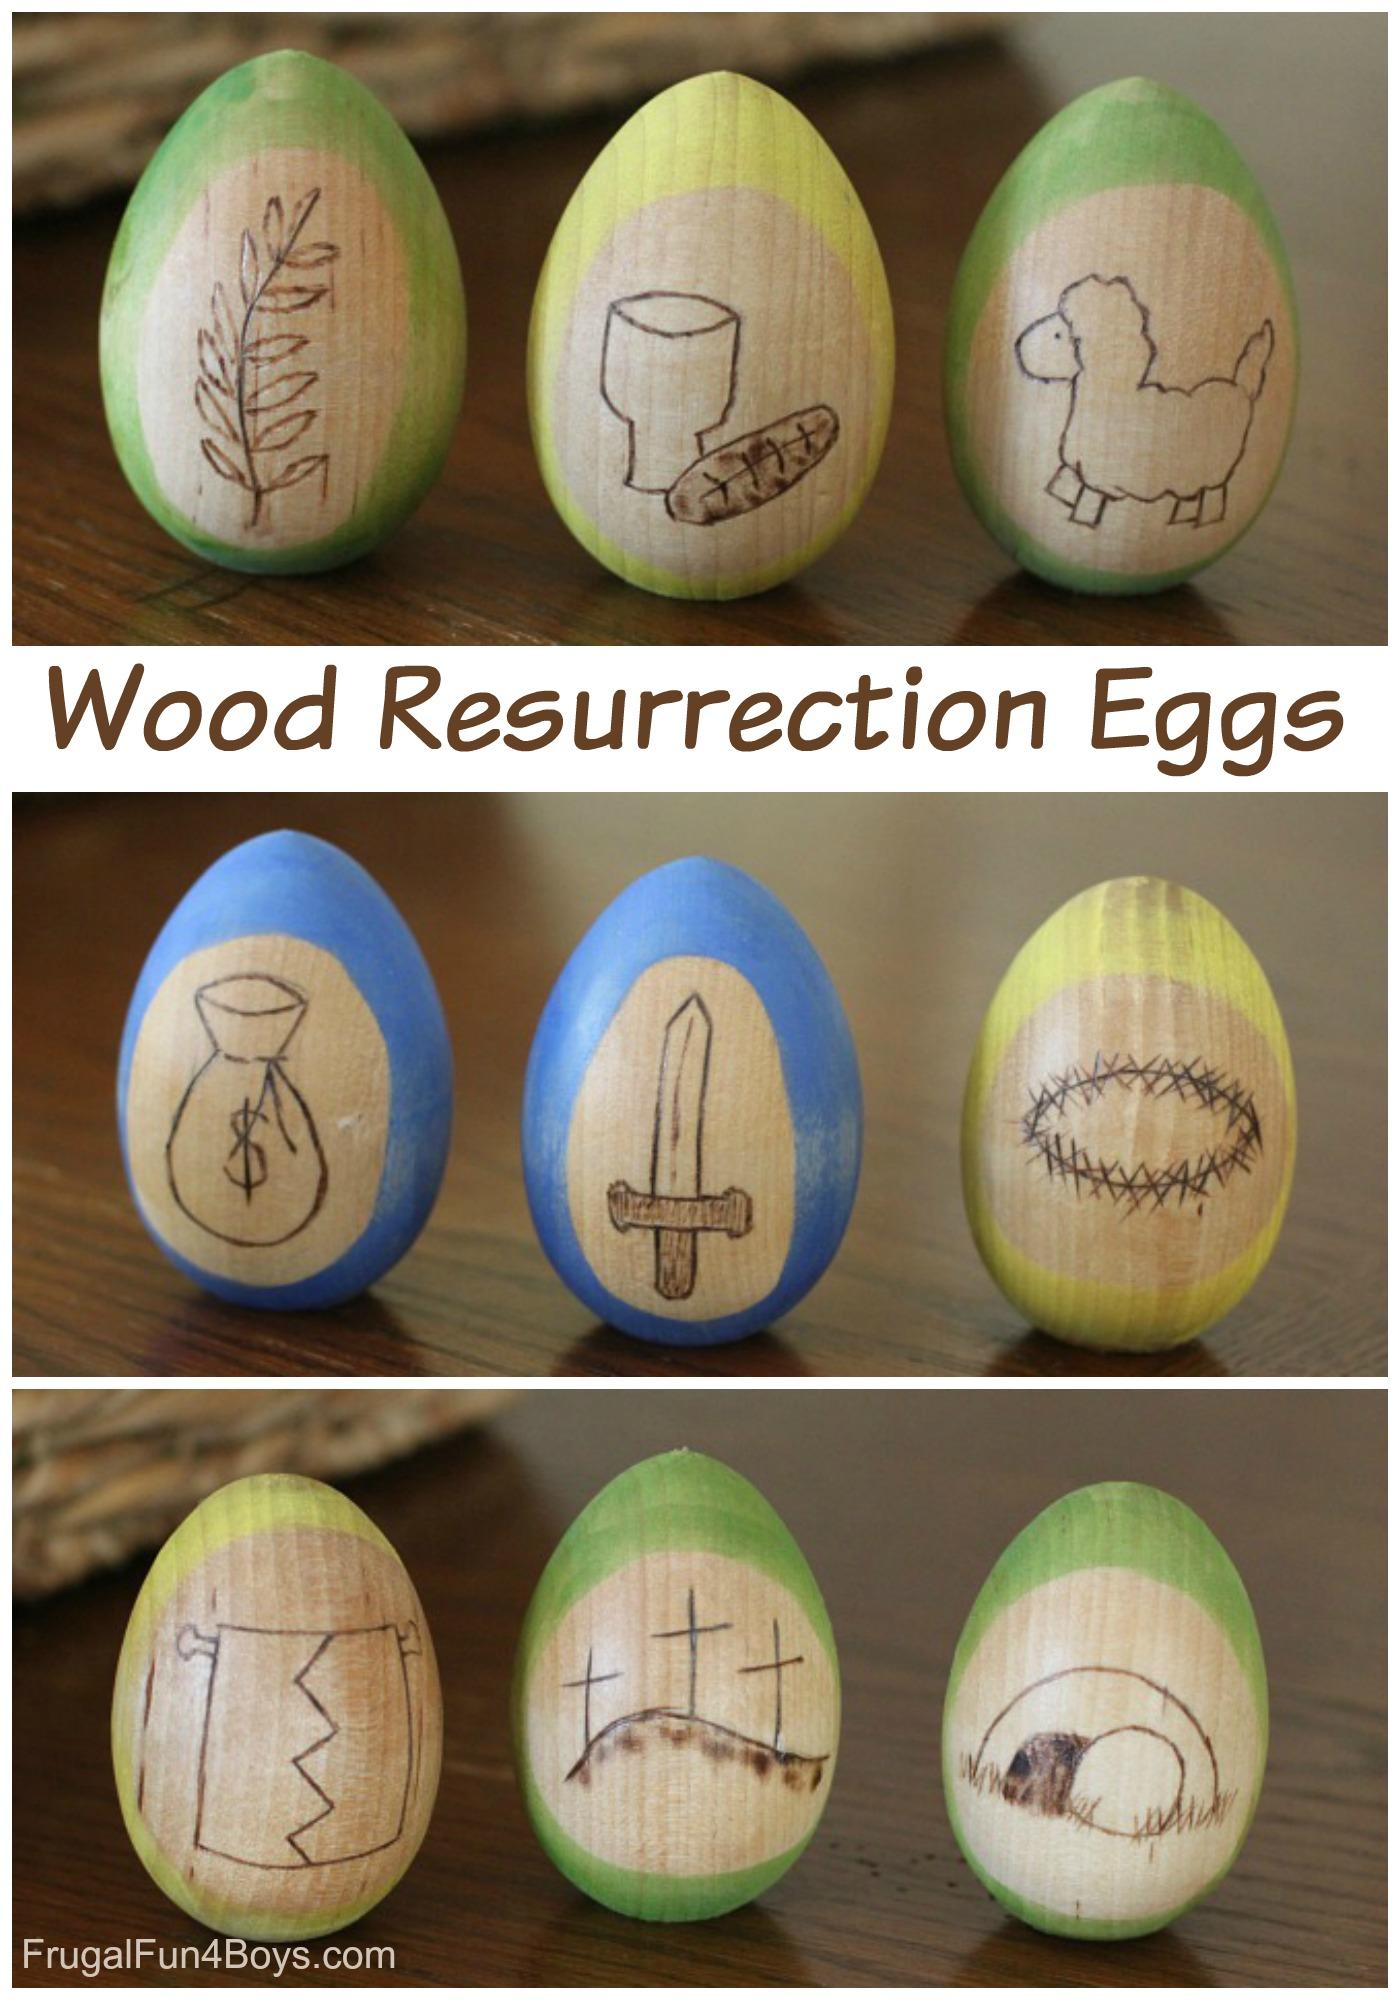 Wood Resurrection Eggs - Tell the Easter Story